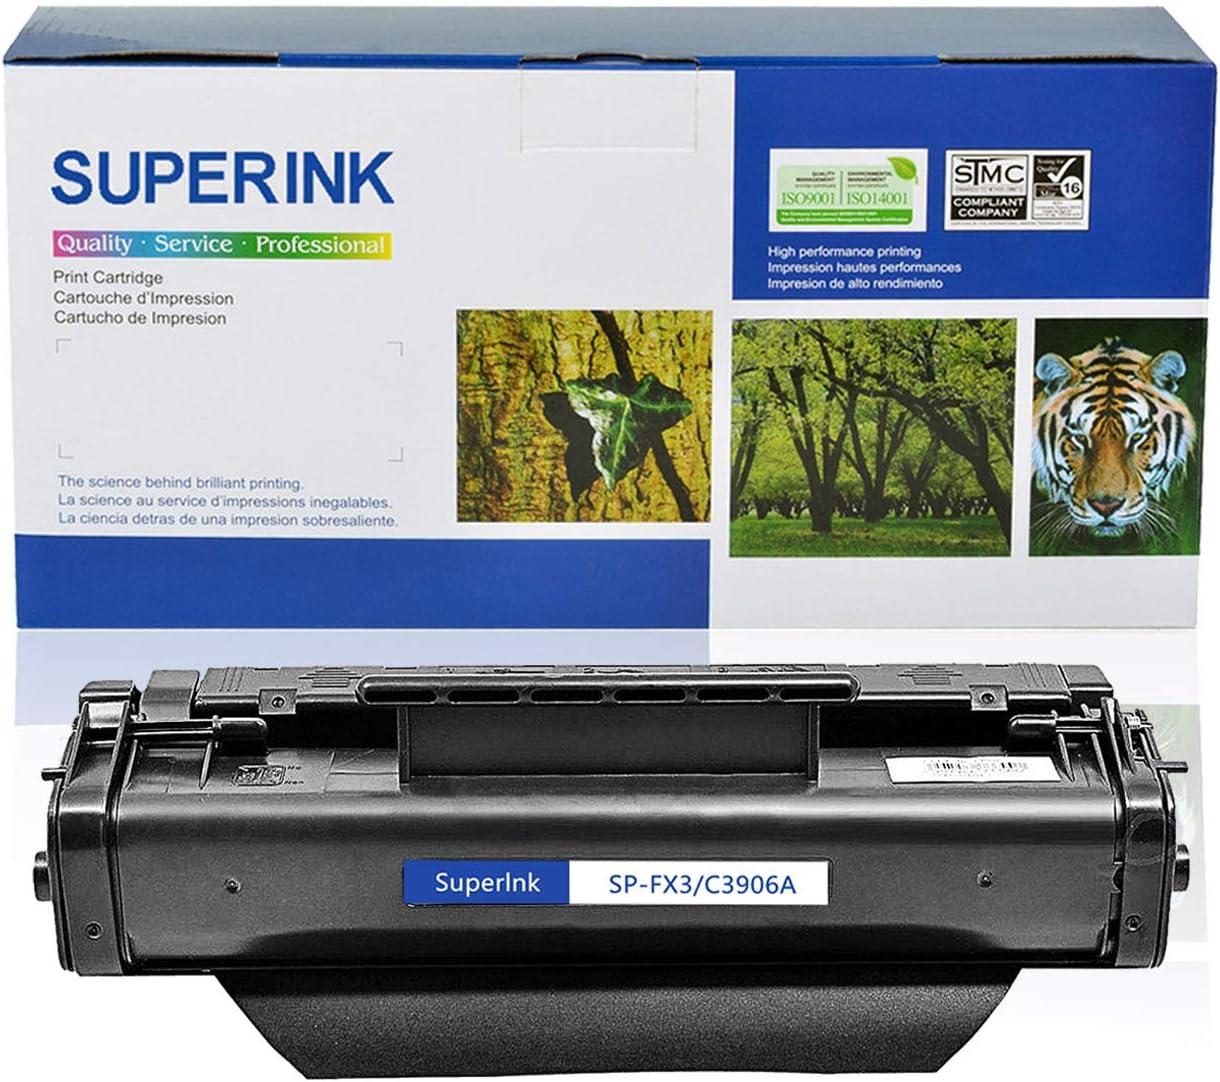 SuperInk 1 Pack Compatible Toner Cartridge Replacement for HP 06A C3906A Black use in Laserjet 5L, 5L Xtra, 5L-FS, 6L 6Lse 6Lxi 3100 3100se 3100xi 3150 3150se 3150xi Printer